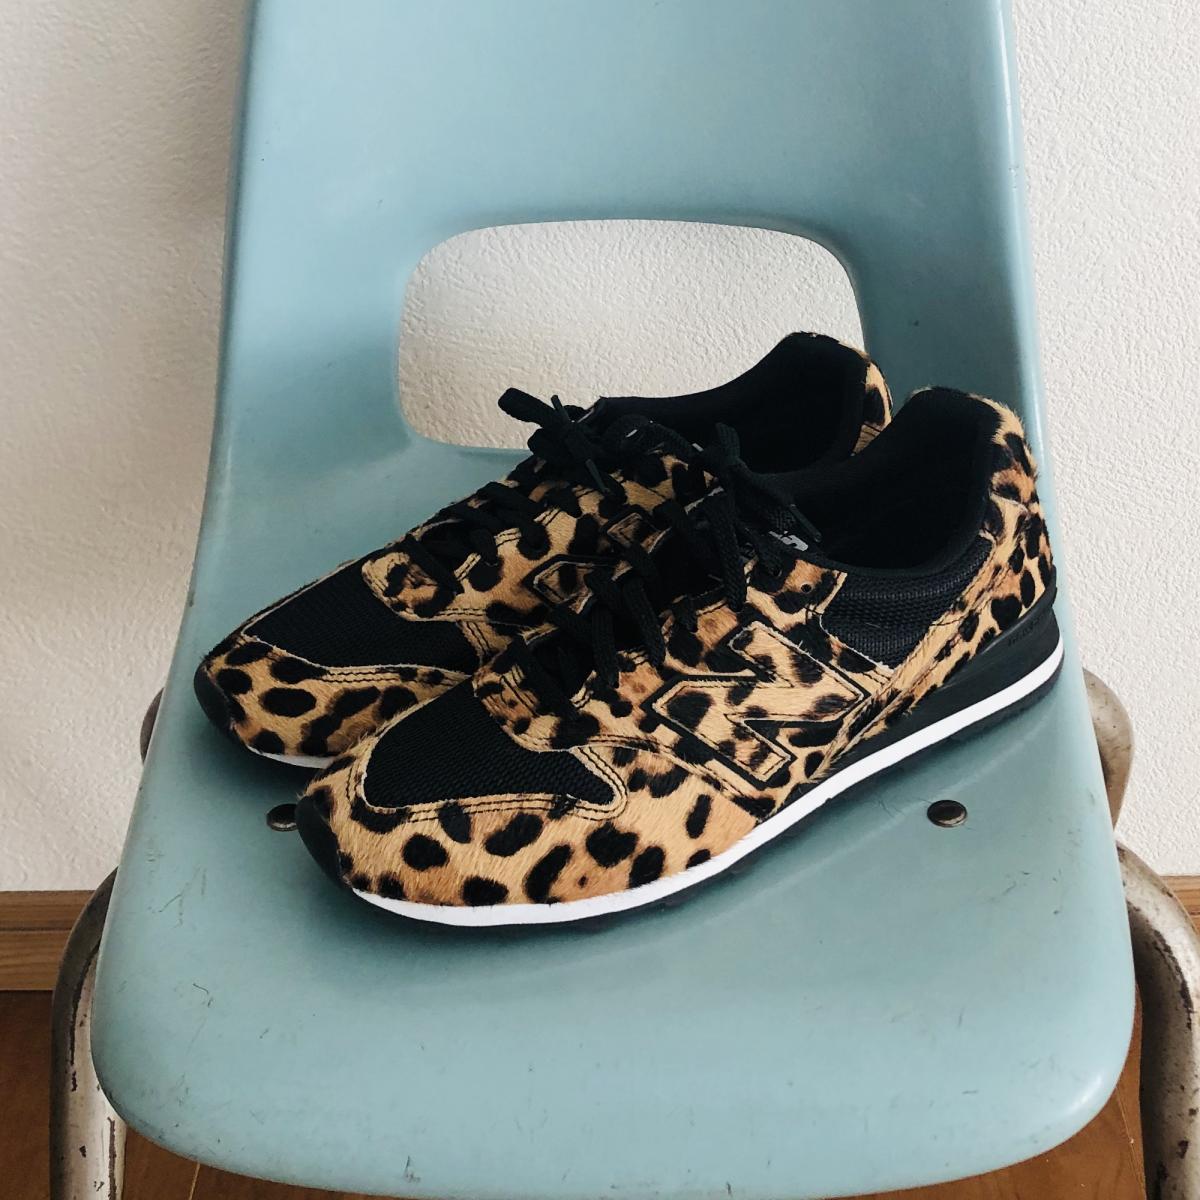 New Balance® X J.Crew 996 sneakers in leopard calf hair